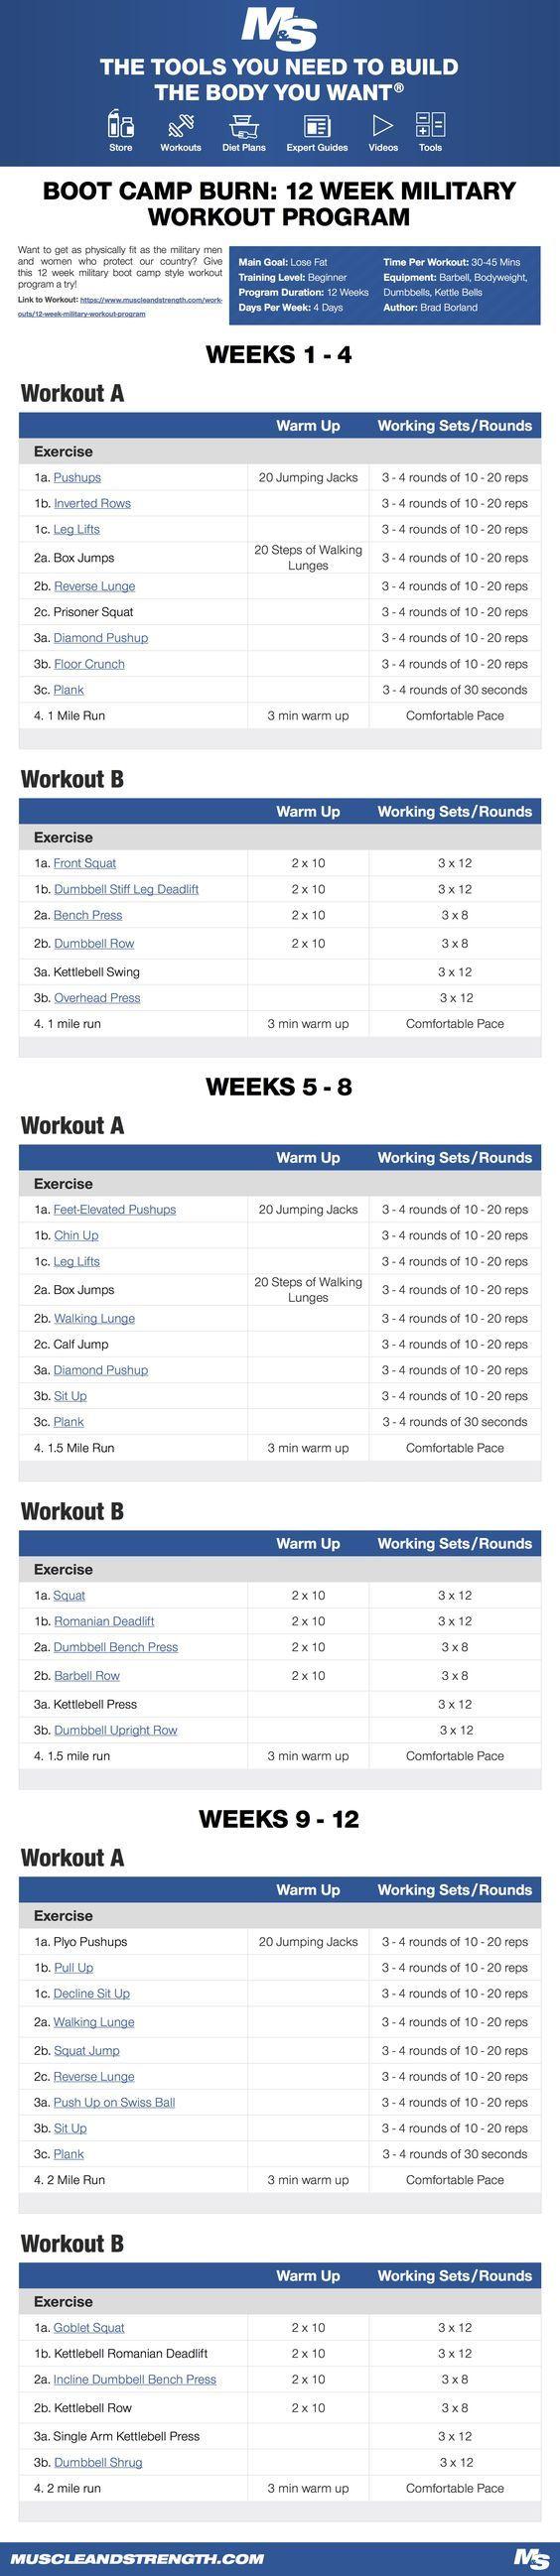 Boot Camp Burn: 12 Week Military Workout Program | exercise